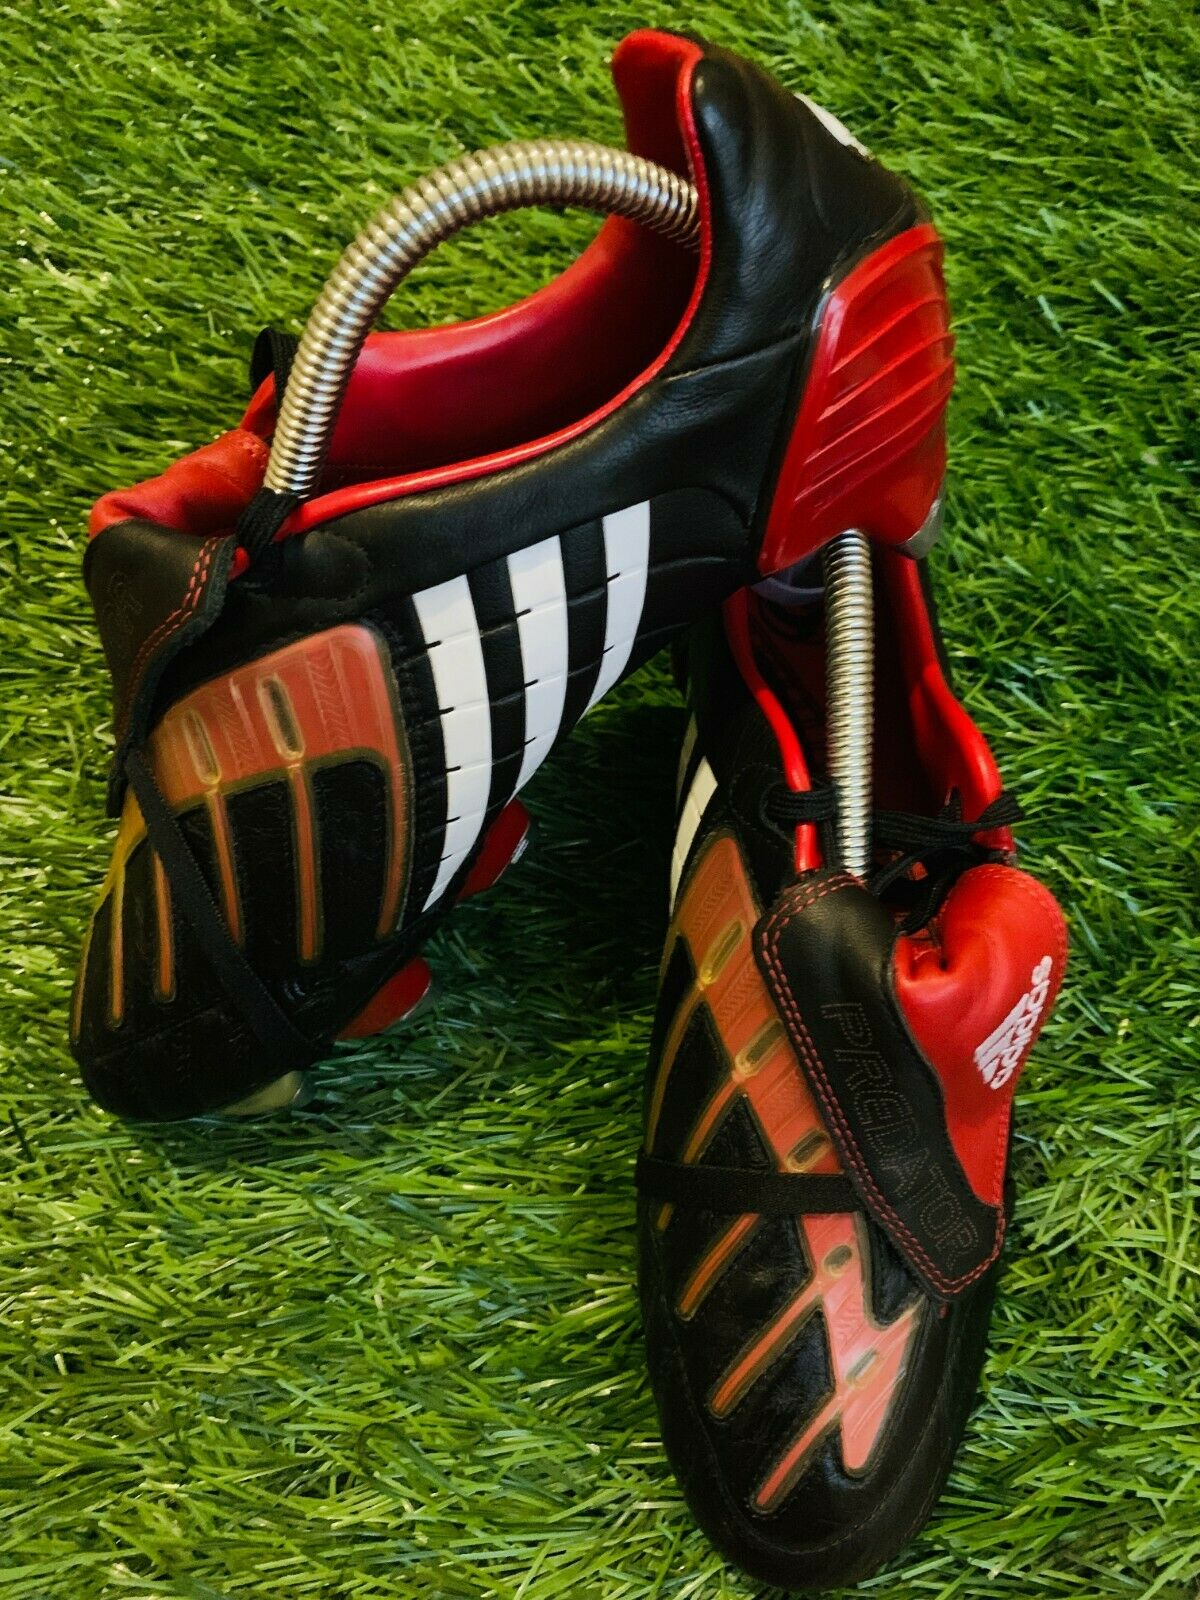 Adidas Projoator Powerswerve Trx Sg 013633 8US 7,5UK 2007 Beckham Nuevo Raro